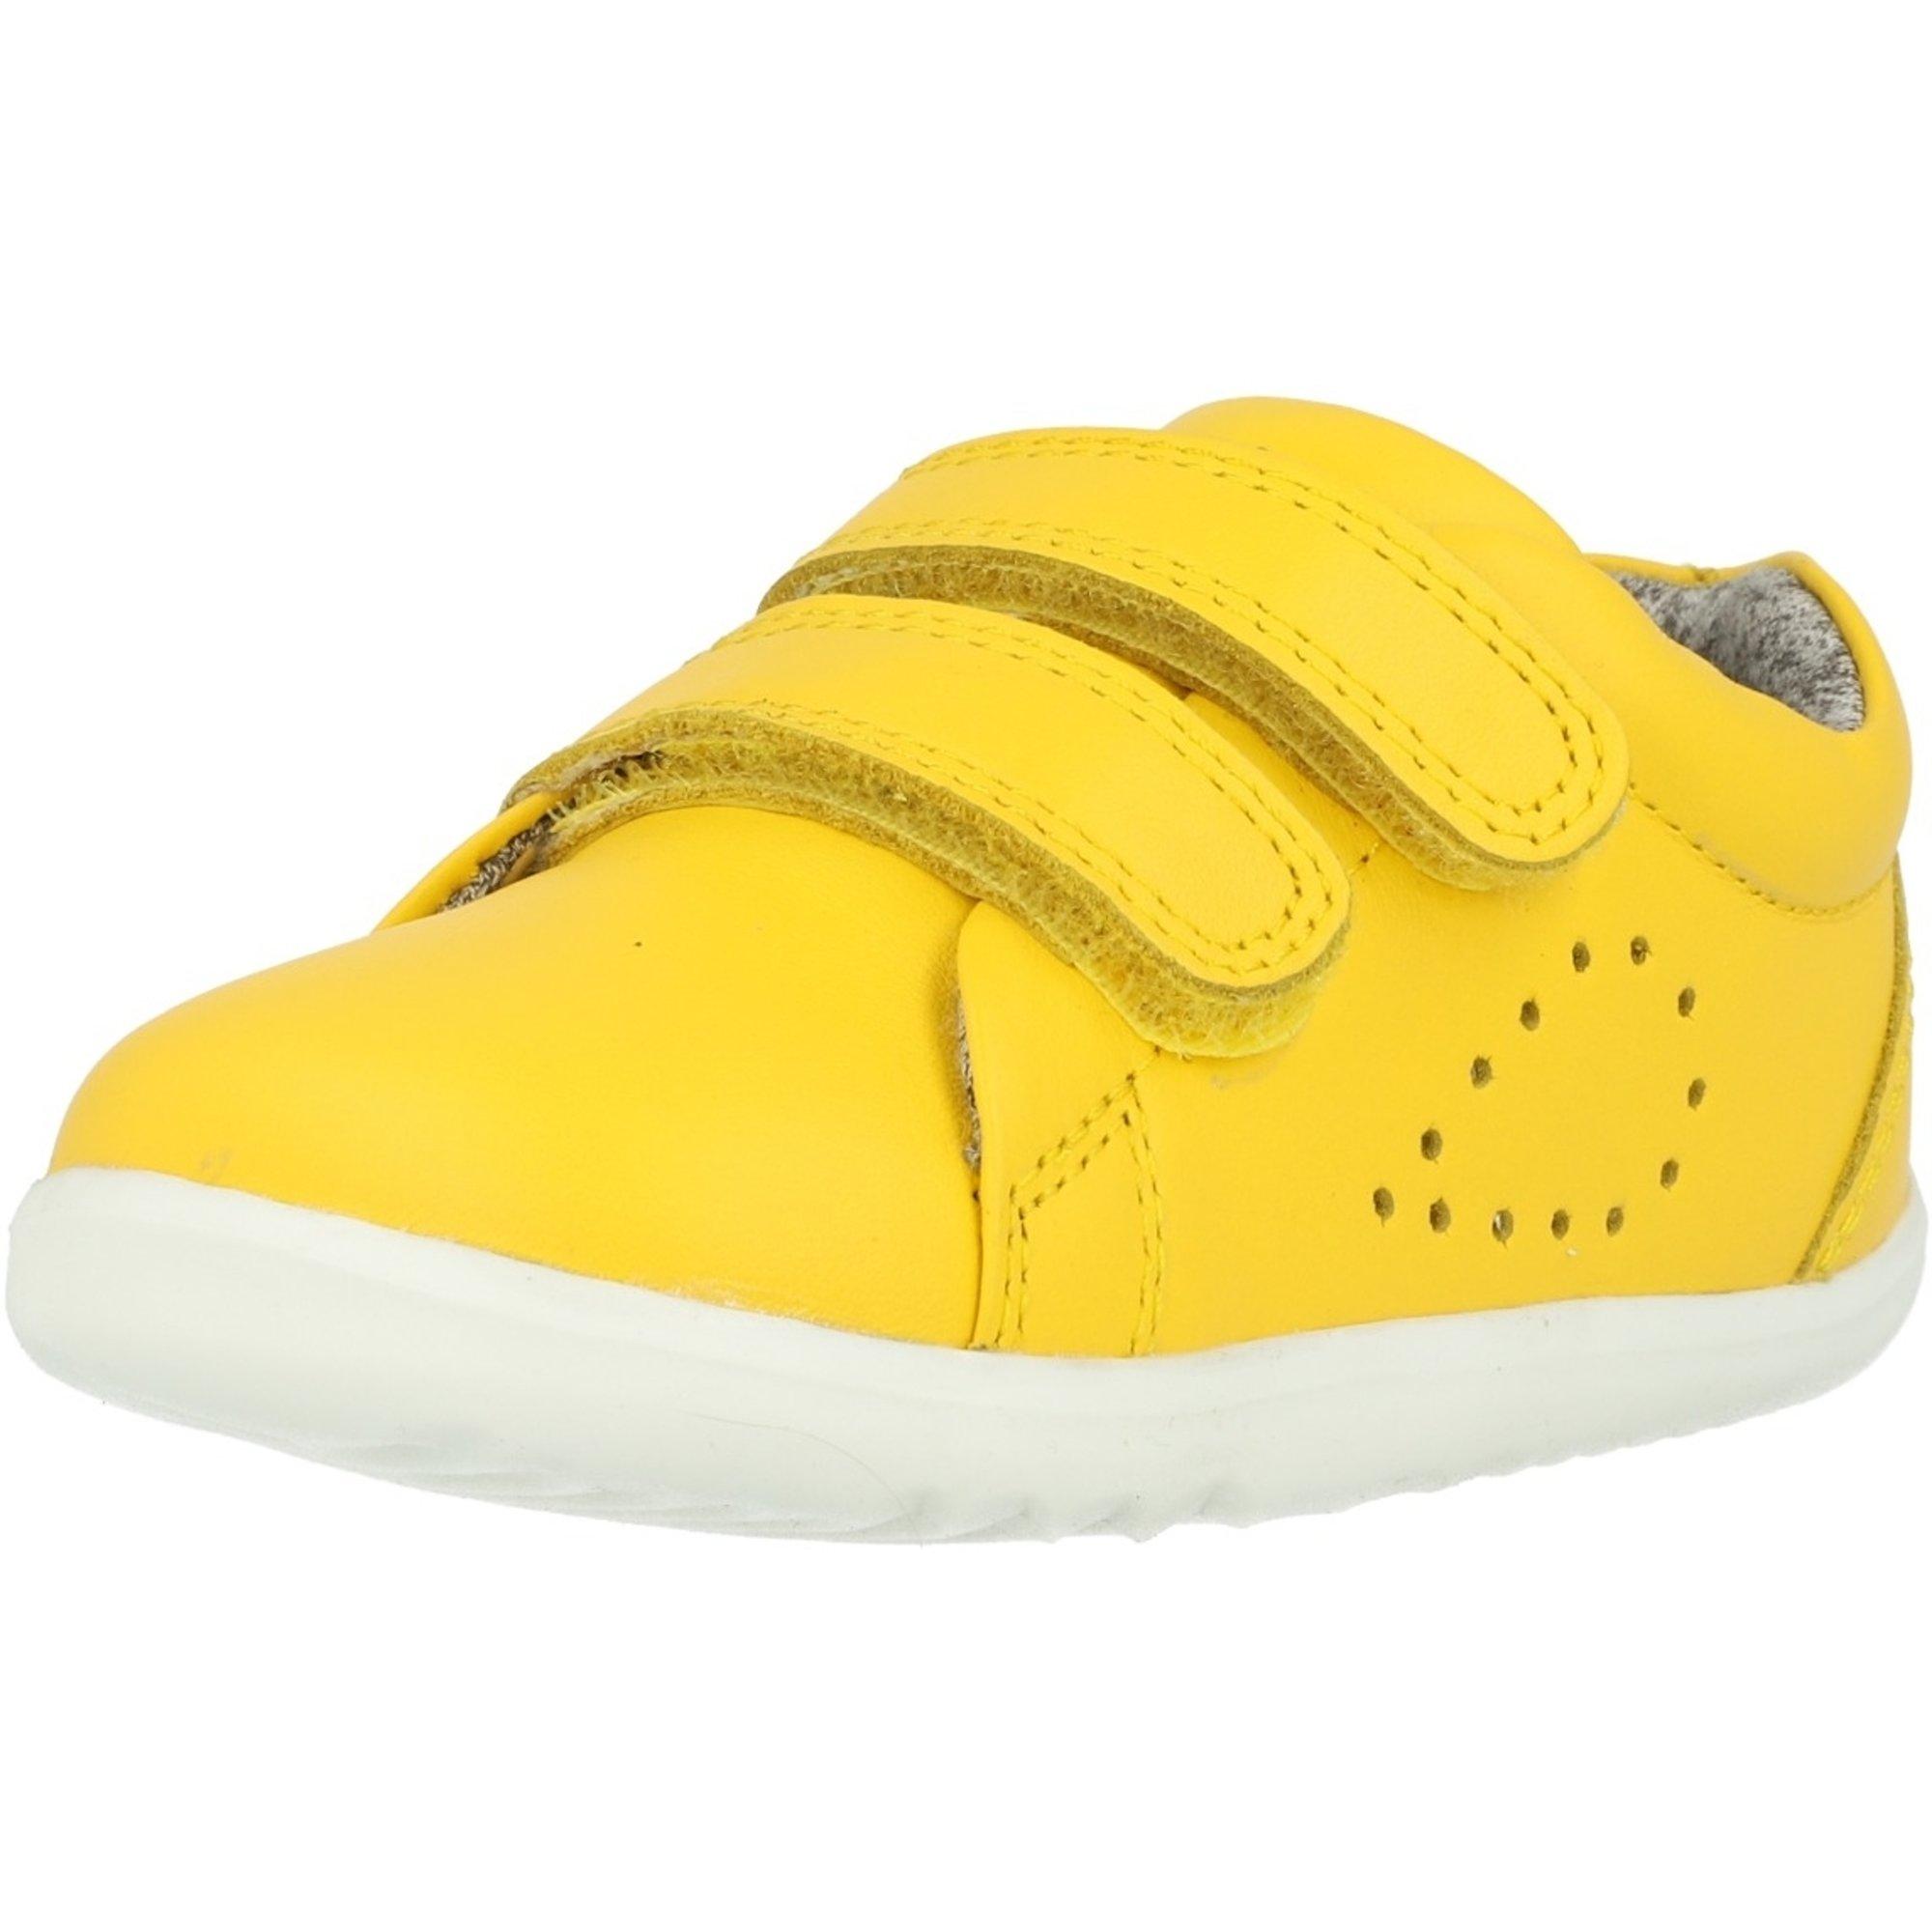 Bobux Step Up Grass Court Lemon Leather Infant